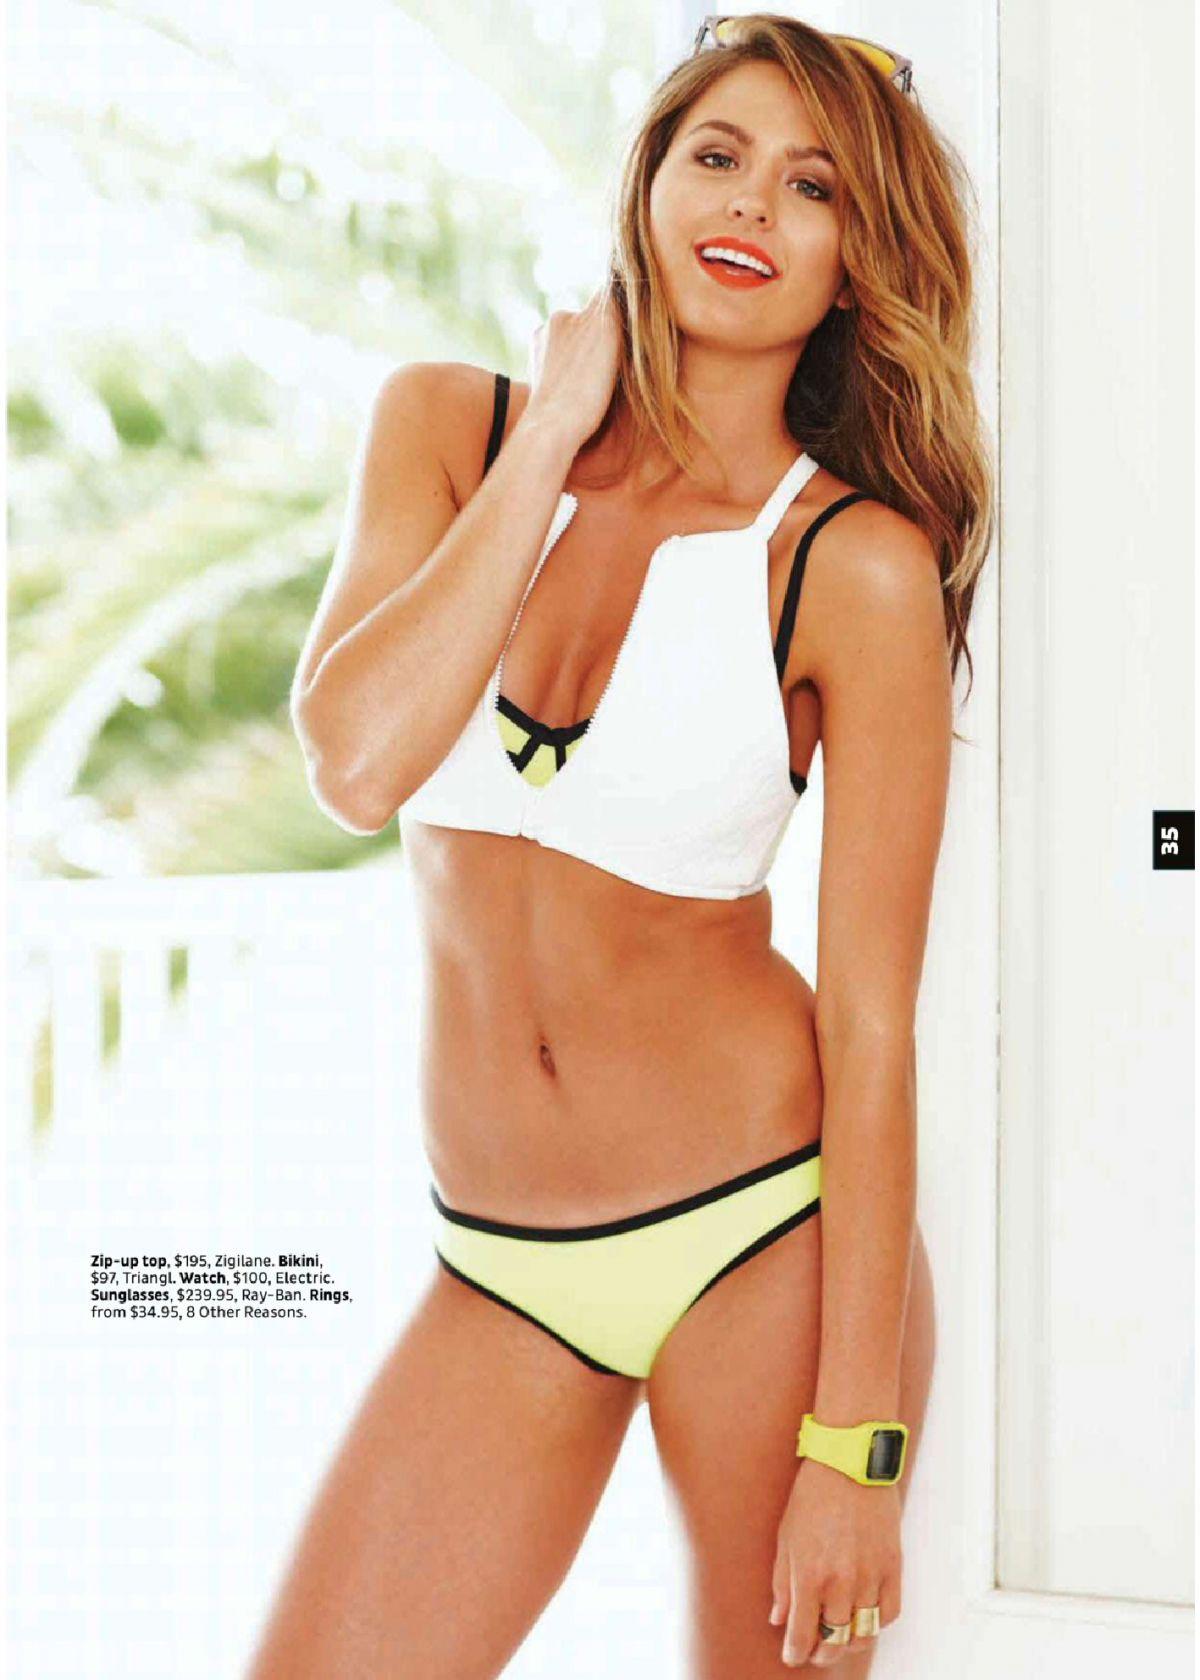 JESTINA CAMPBELL in Cleo Magazine, Australia January 2015 Issue